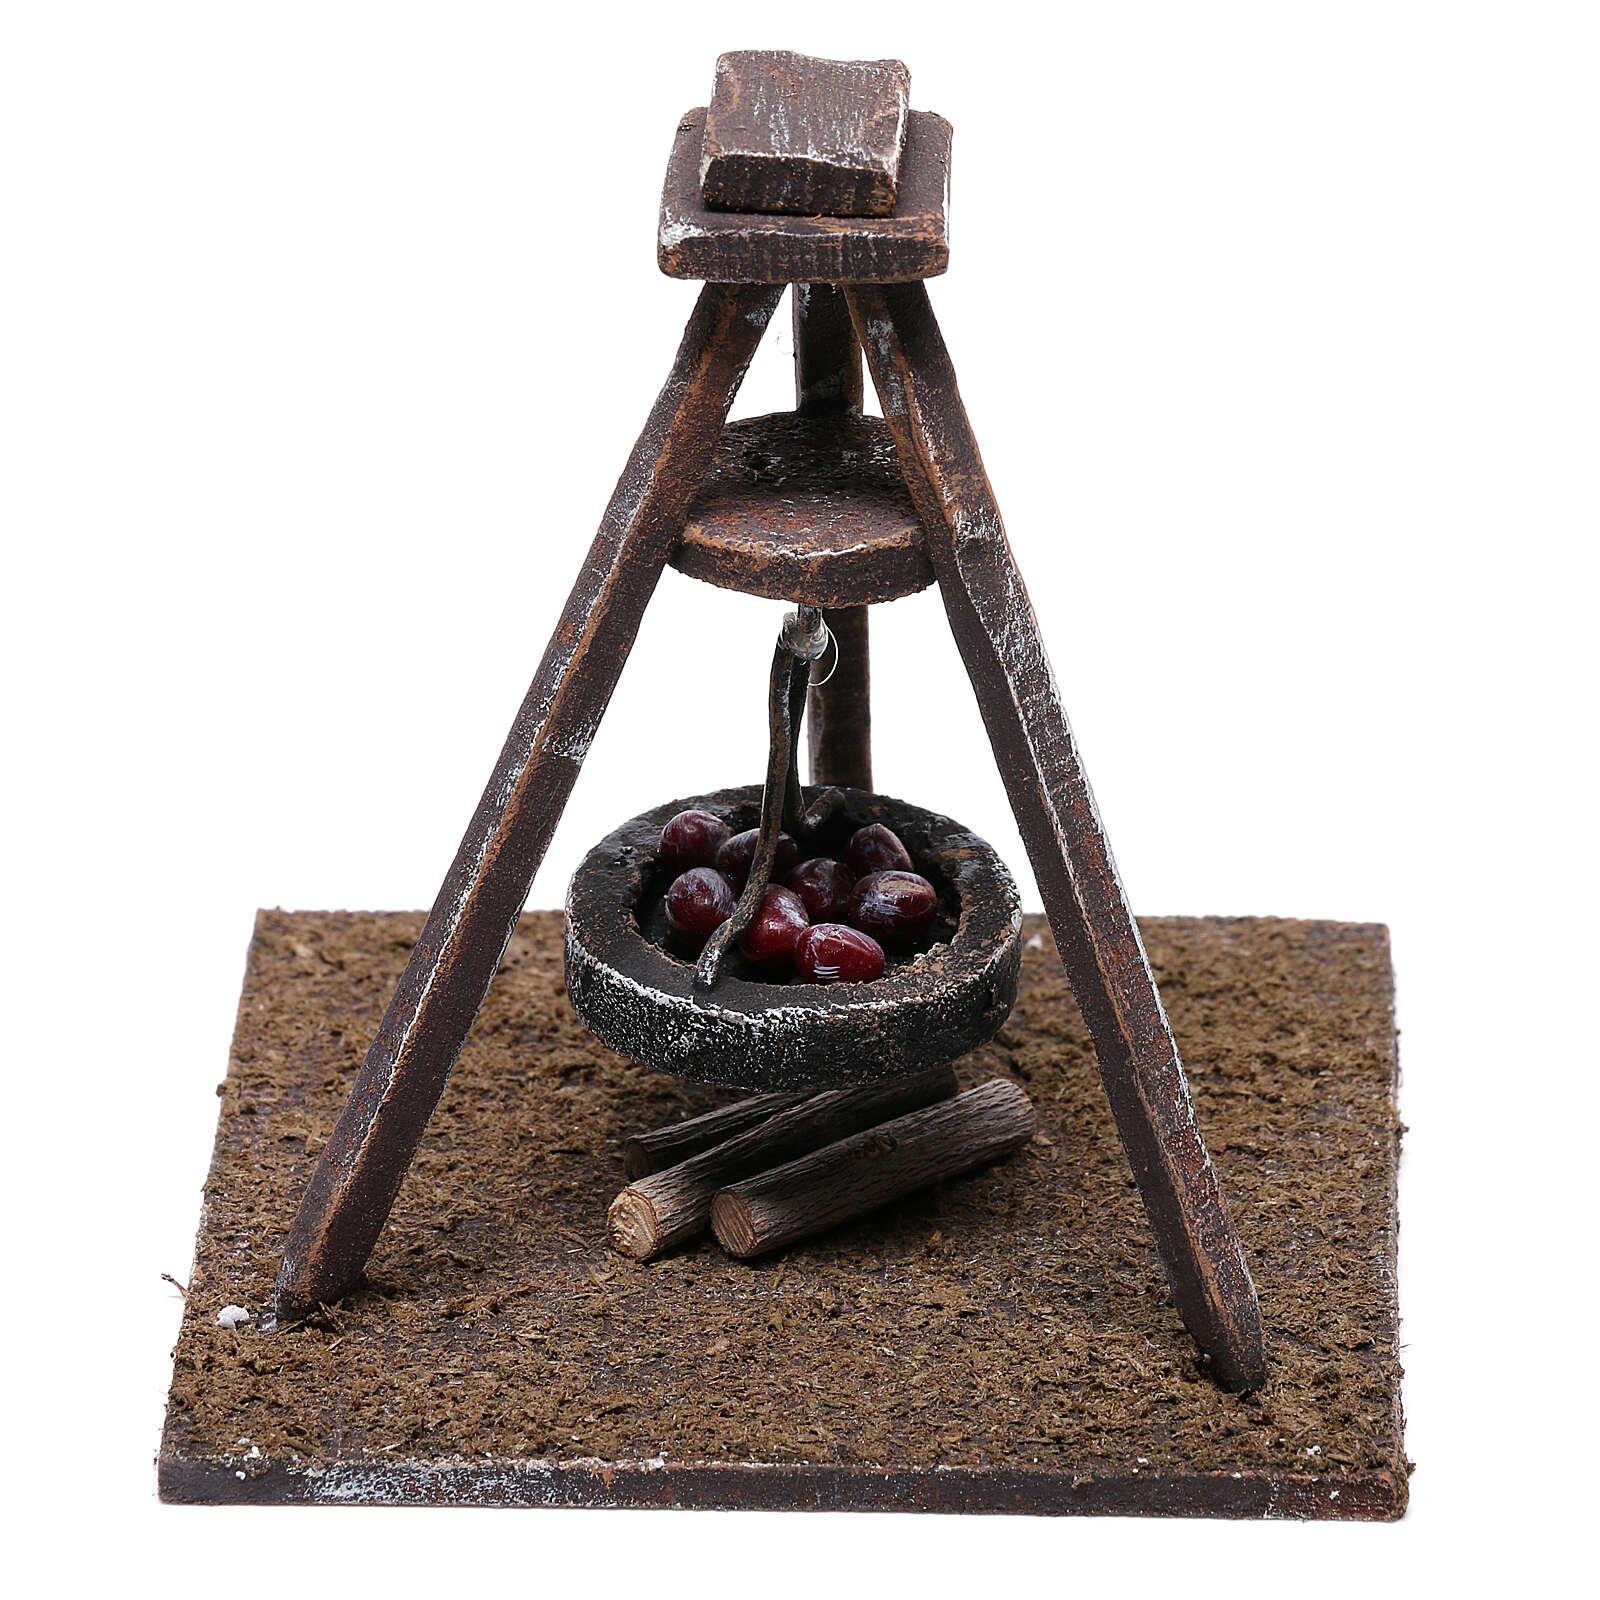 Miniature chestnut roaster 5x10x10 cm, for 10 cm nativity 4